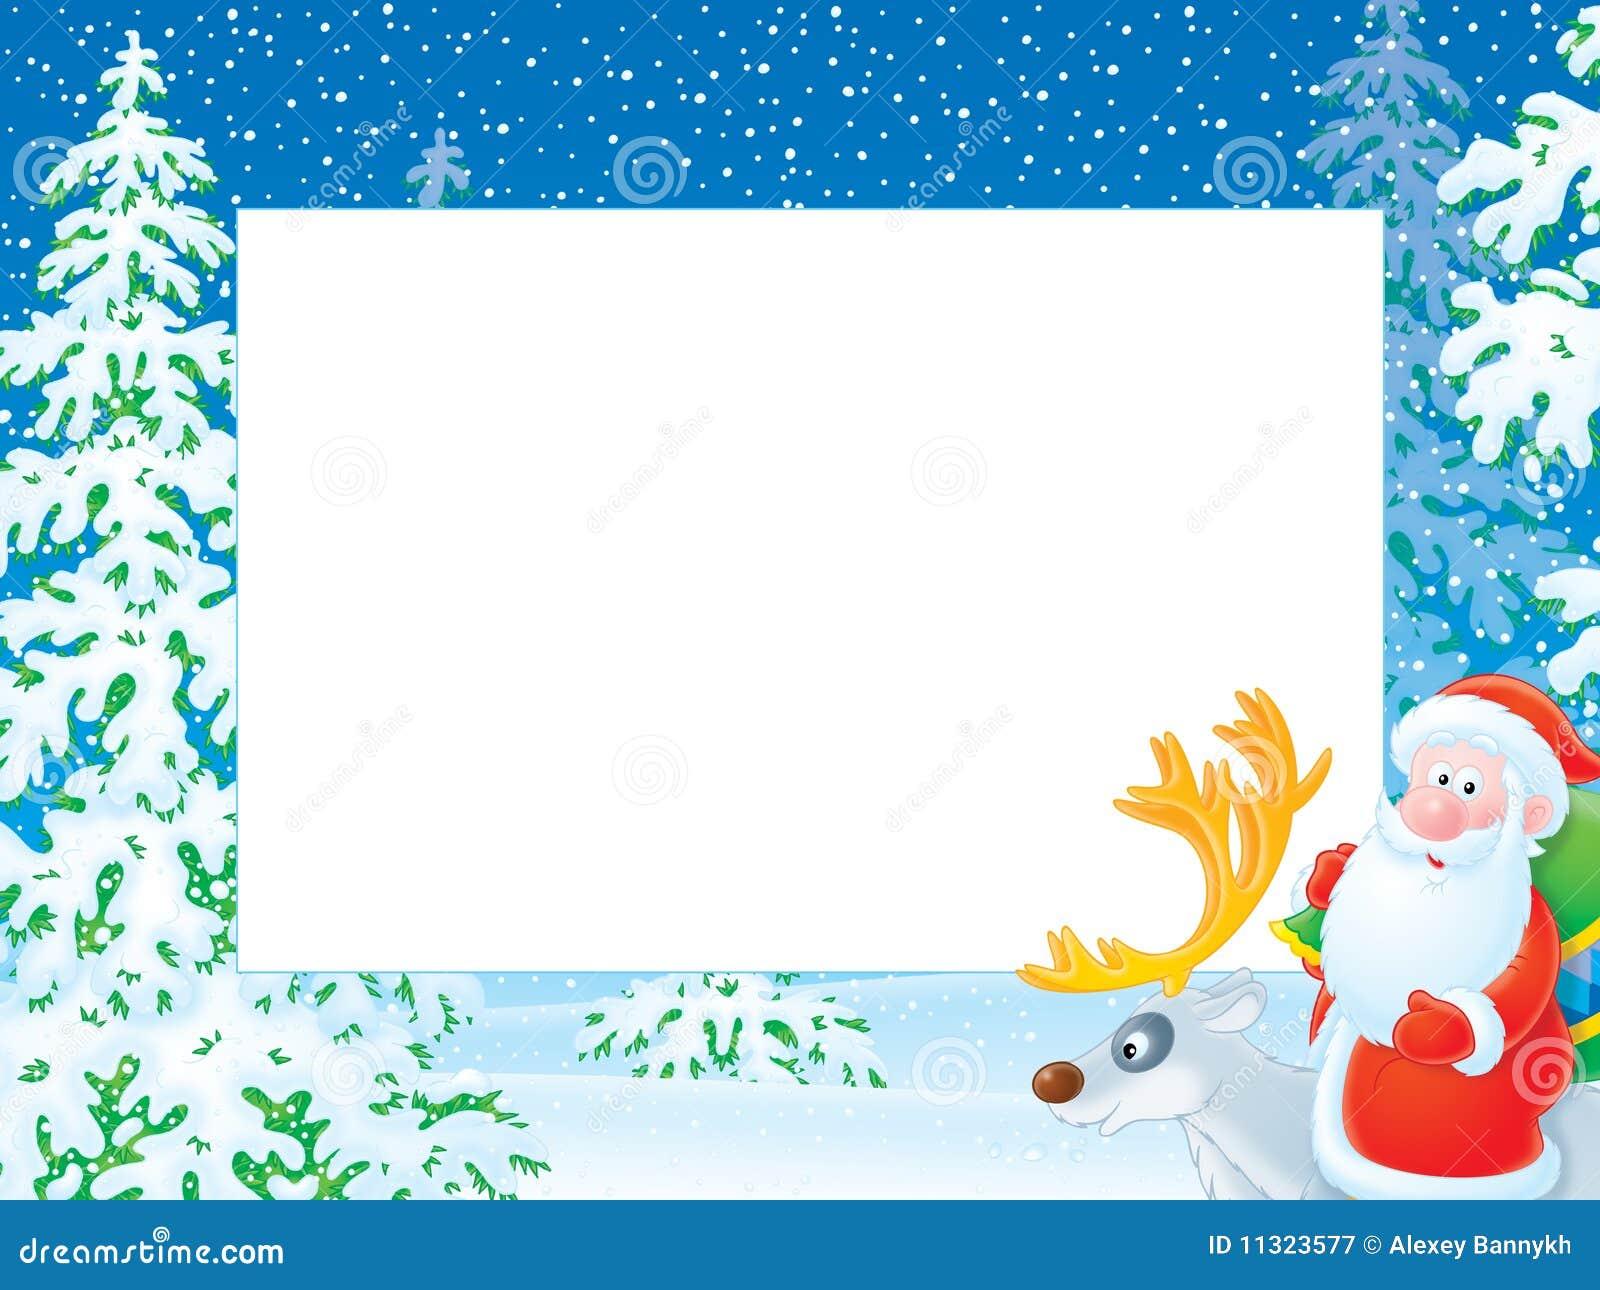 Christmas Photo Frame With Santa Claus Riding On R Stock ...